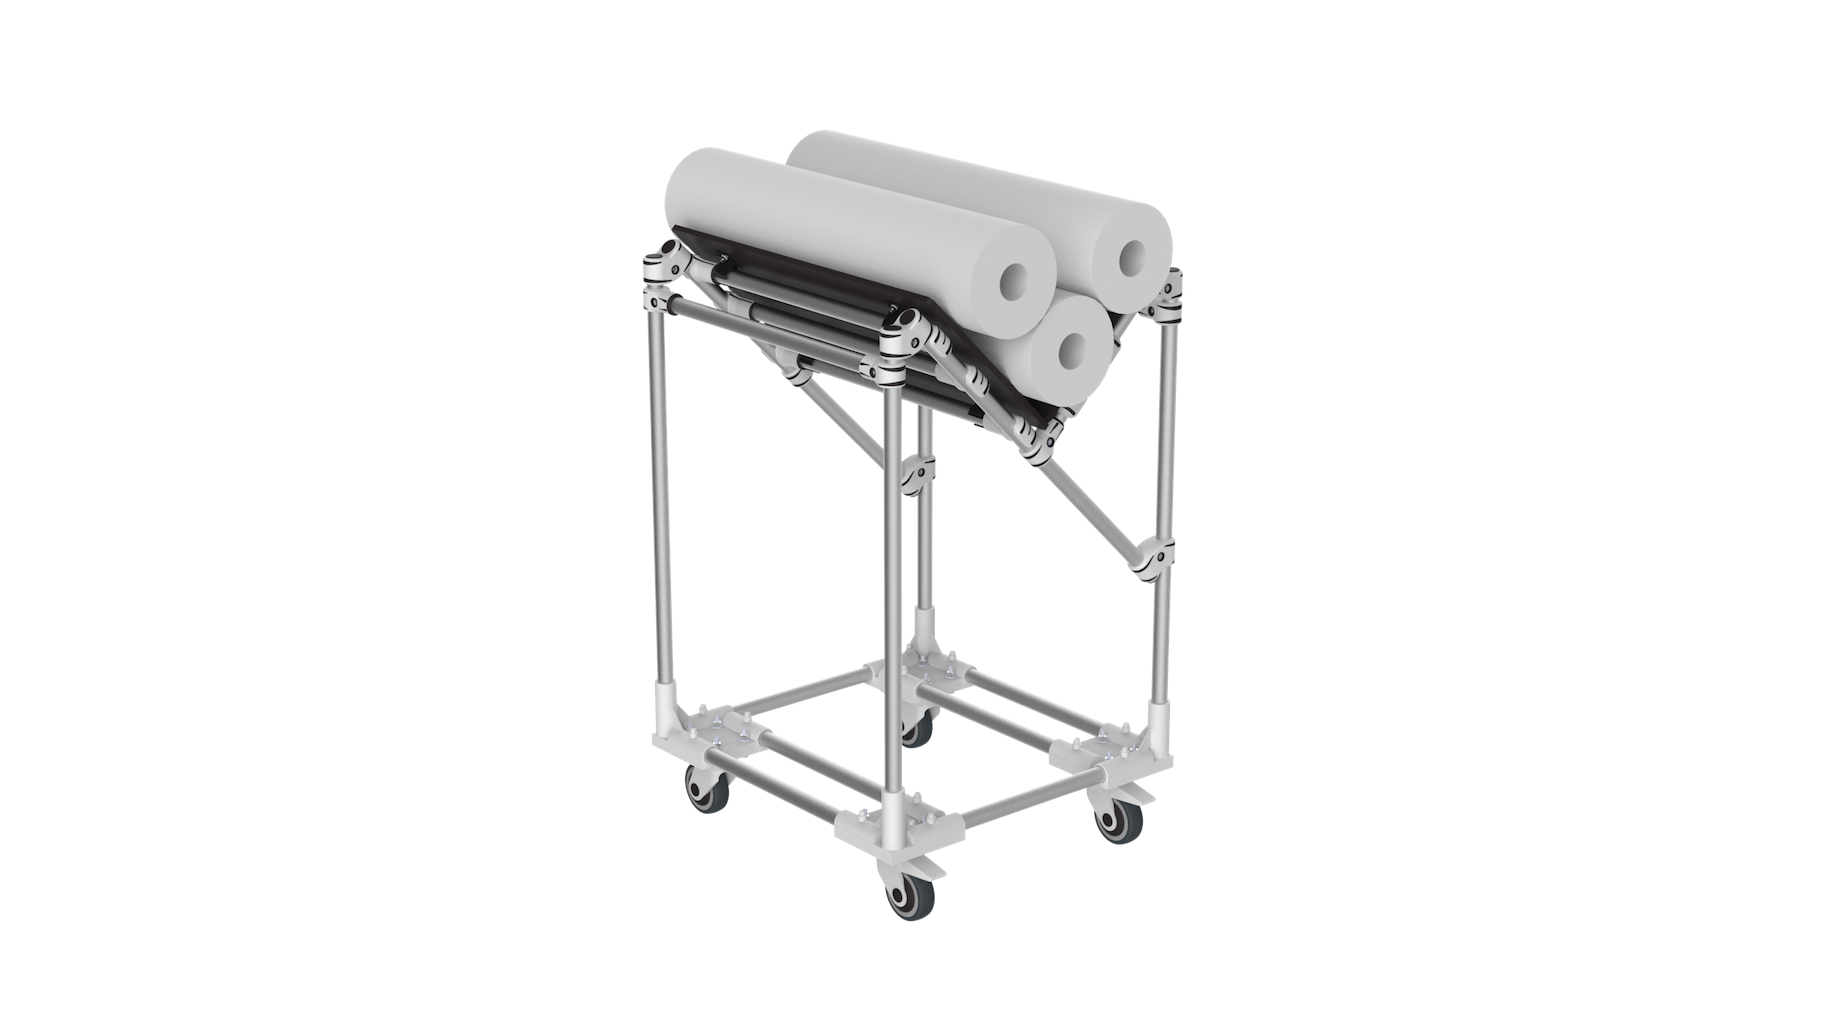 V shape trolley